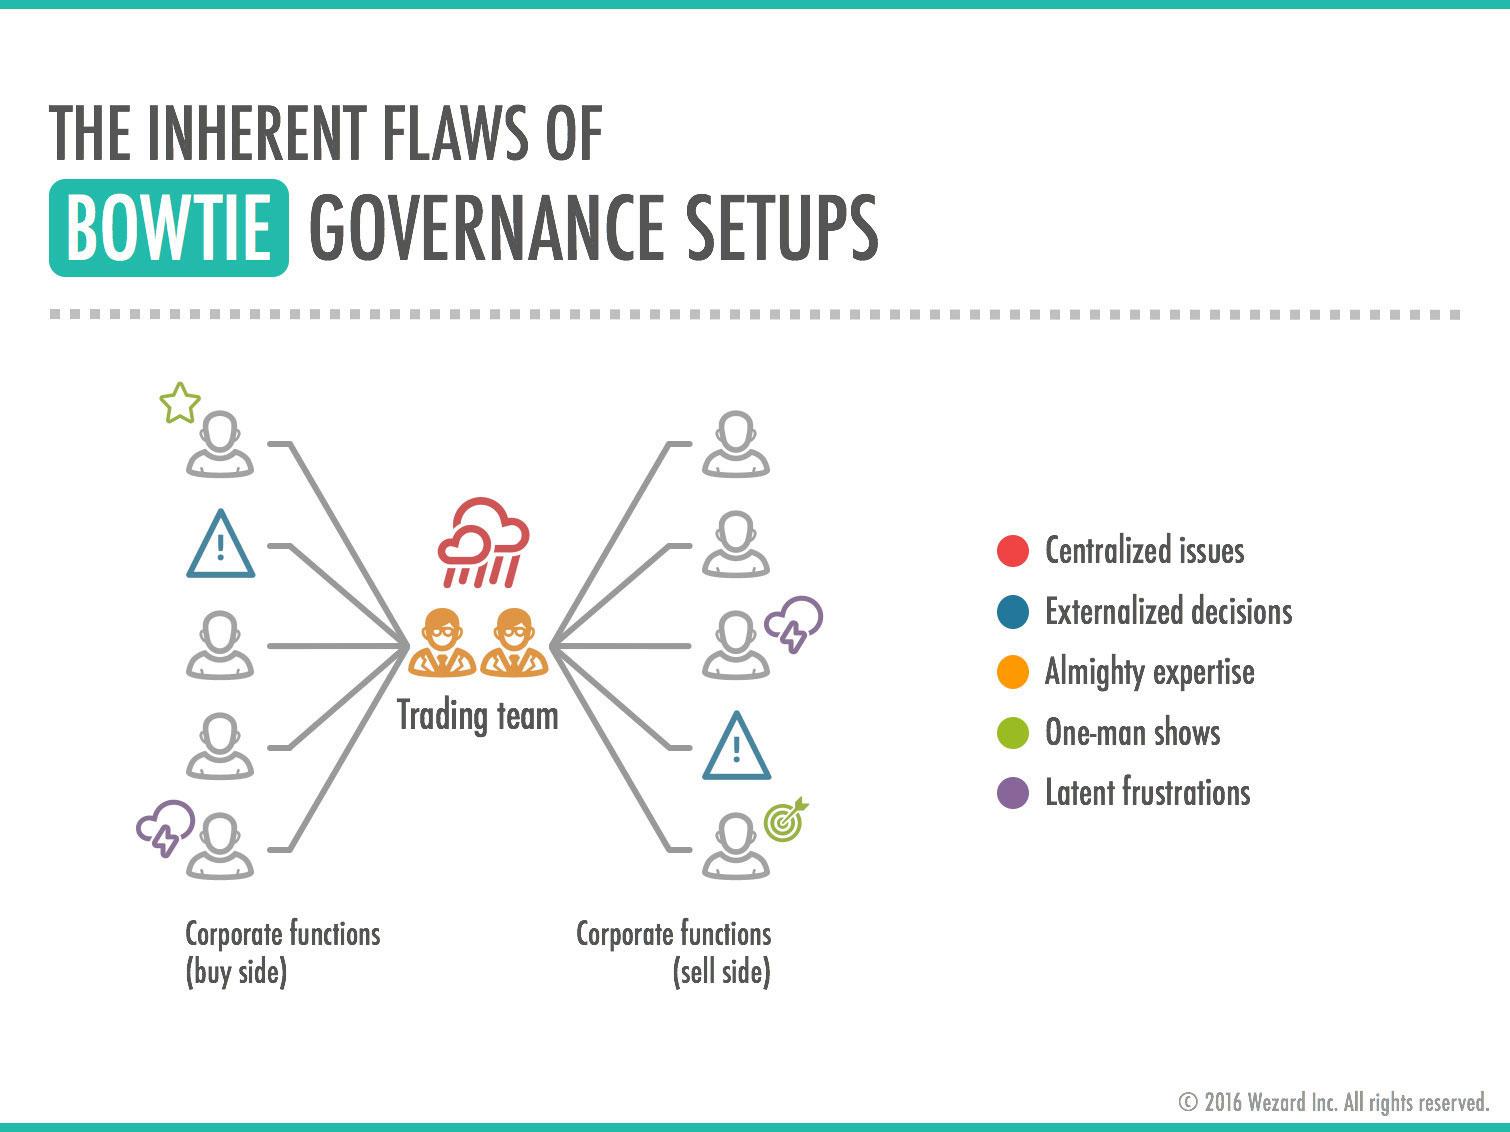 Wezard - The inherent flaws of bowtie governance setups